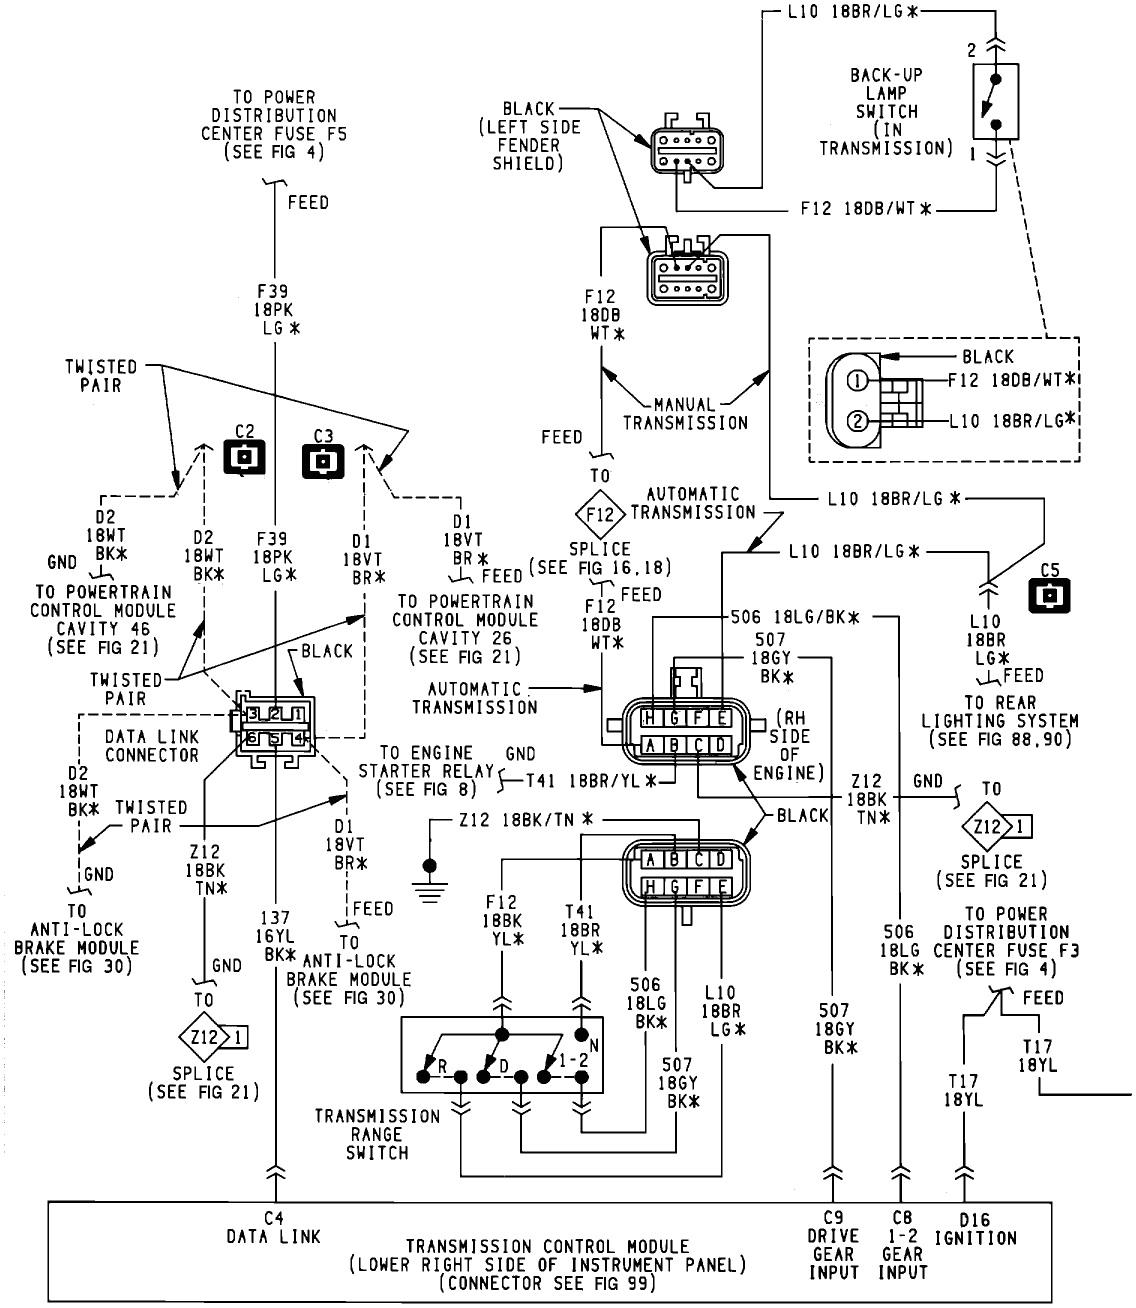 1994 jeep cherokee starter wiring wiring diagram used 1992 jeep cherokee fuse diagram 1993 jeep cherokee fuse diagram